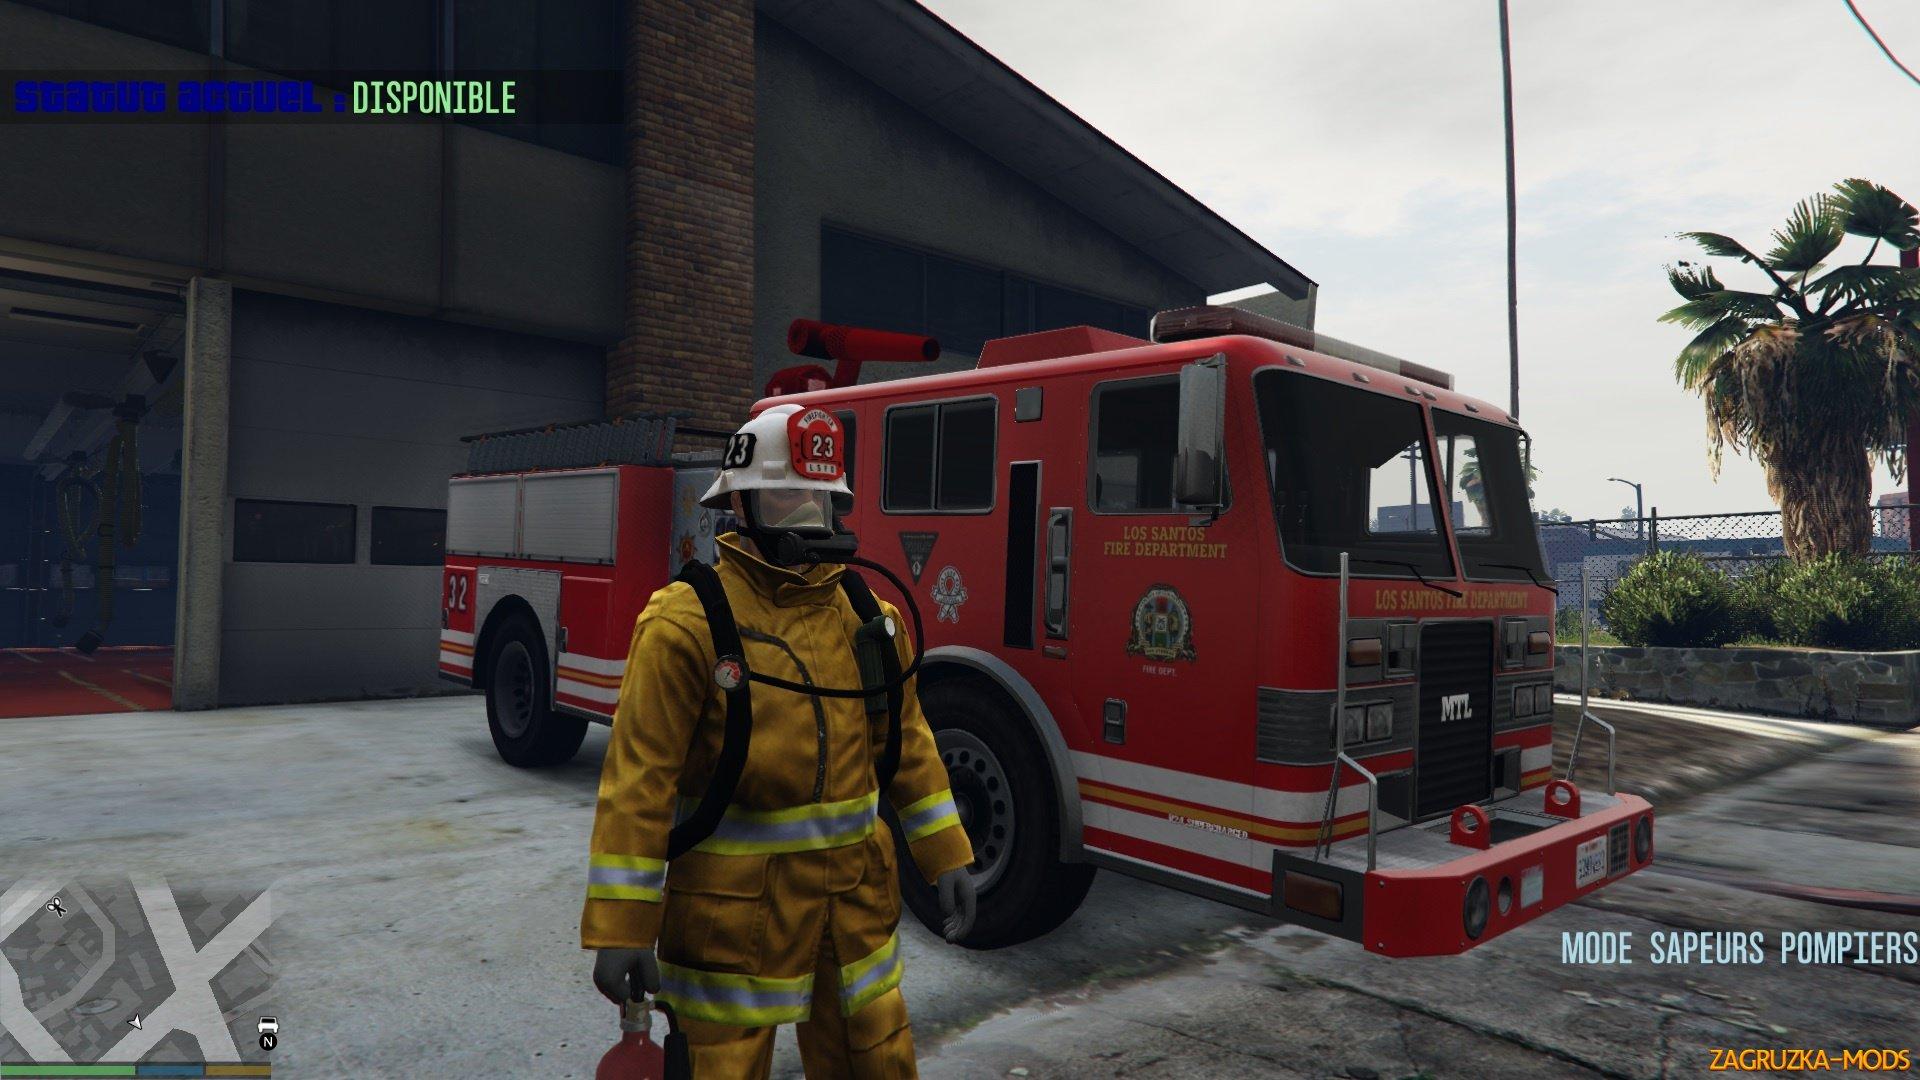 Firefighter Mod (Mode Sapeurs-Pompiers) v2.8 for GTA 5